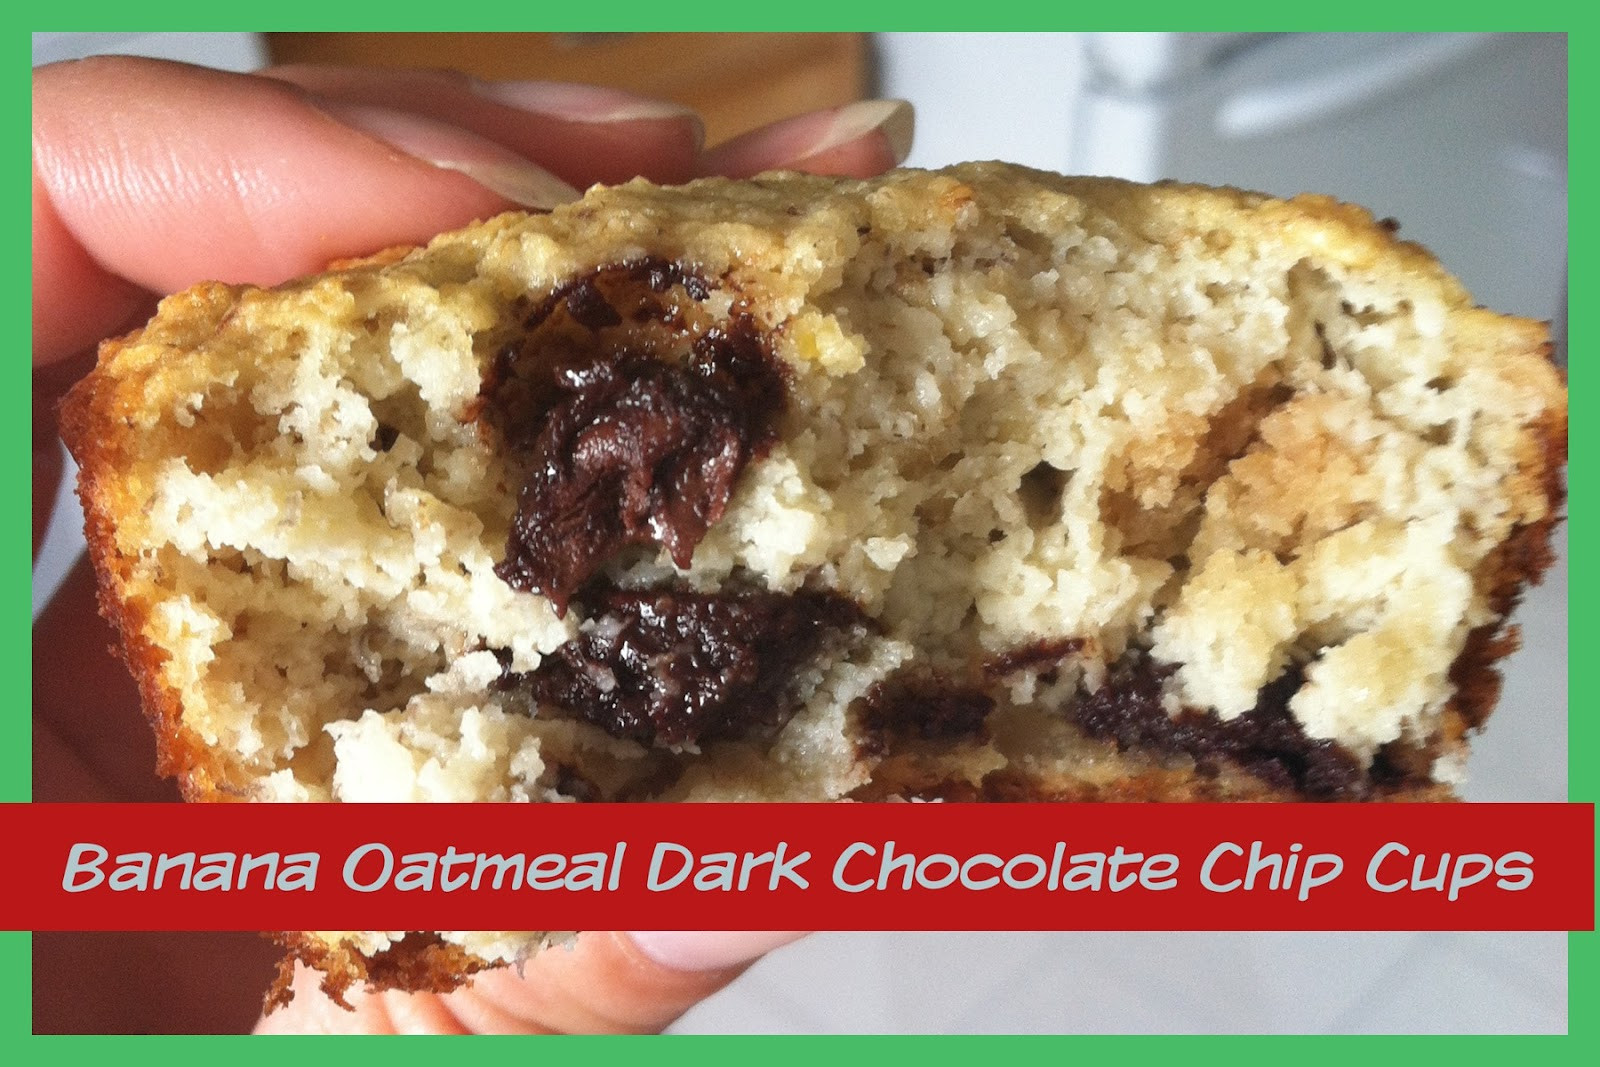 Healthy Banana Oatmeal Chocolate Chip Muffins  Banana Oatmeal Dark Chocolate Chip Muffins Fit and